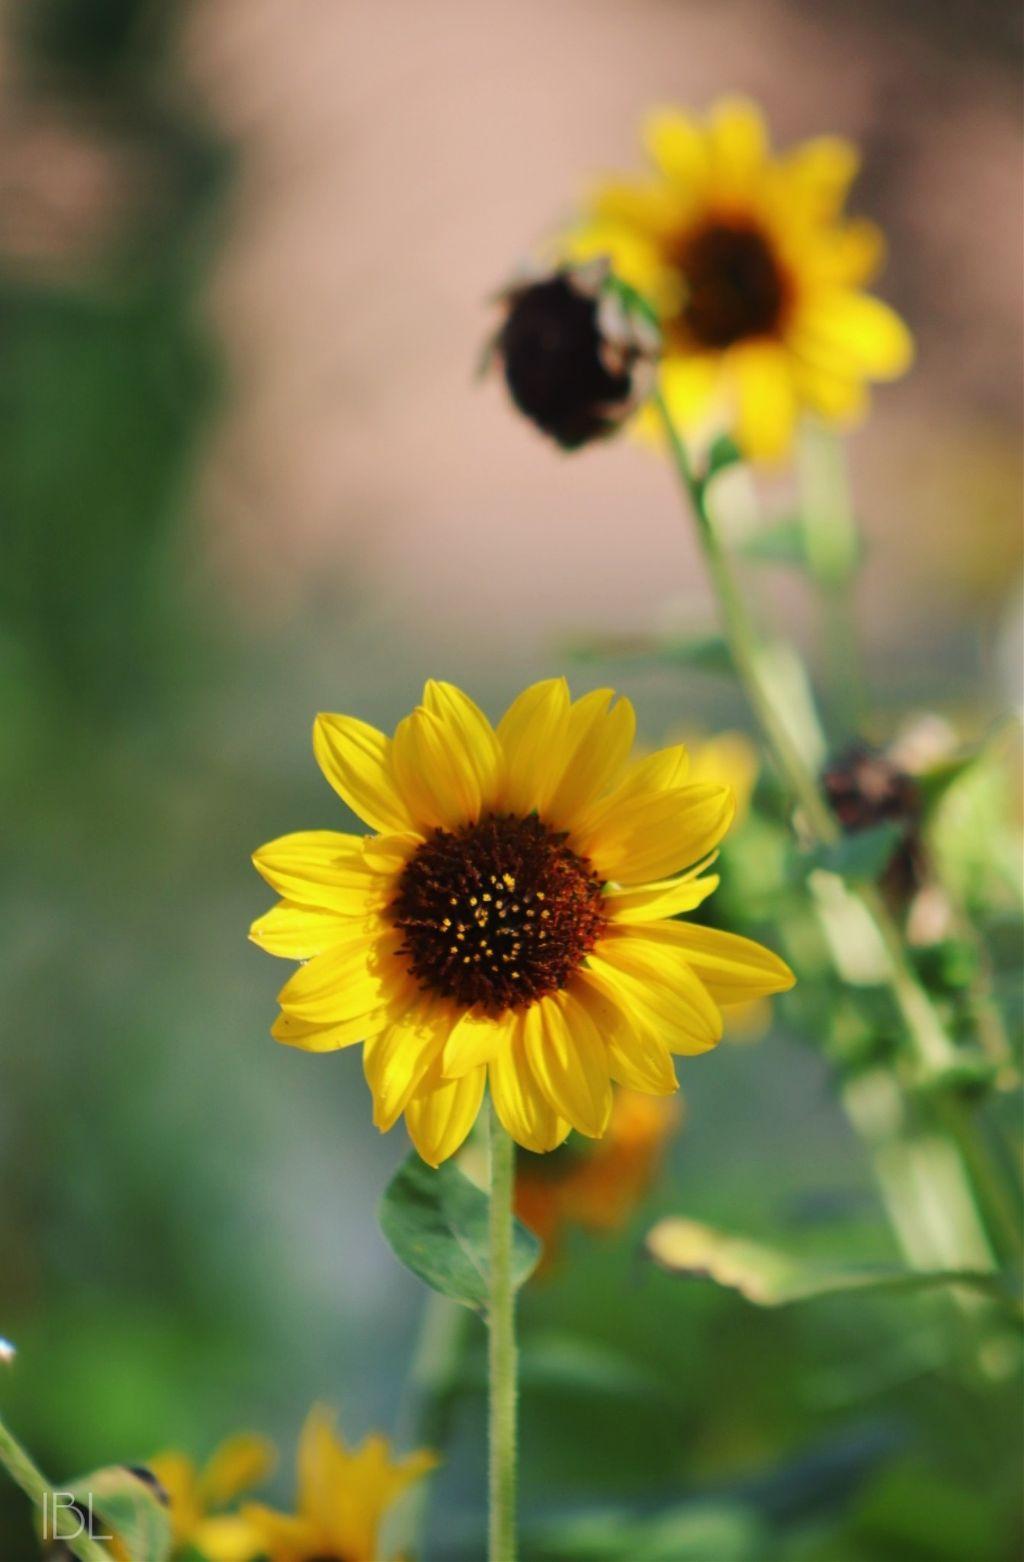 #freetoedit @zanytaz #colorful #nature #photography #flowers #inmyneighborhood #bright #sunflowers #plants #naturallight #canonphotography